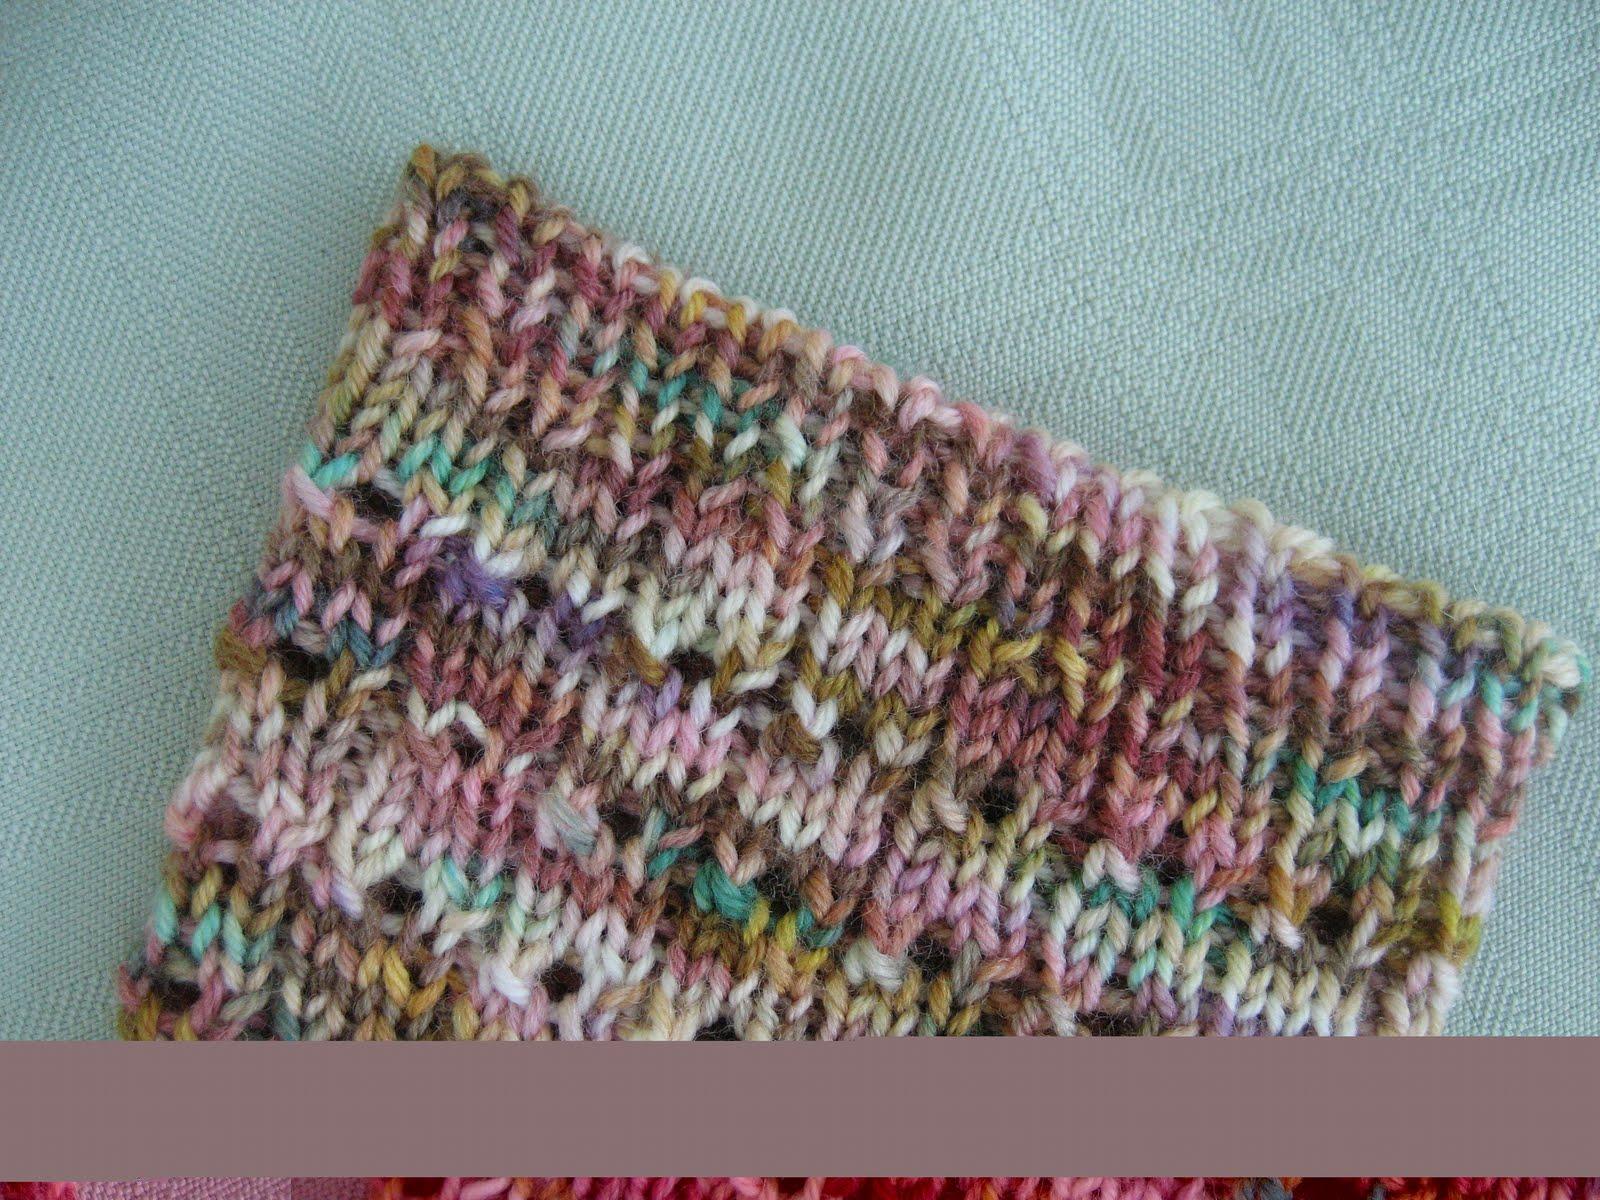 Knit Kitchener Stitch To Finish A Sock : Carolyn Knits: Kitchener Stitch Bind-Off Tutorial